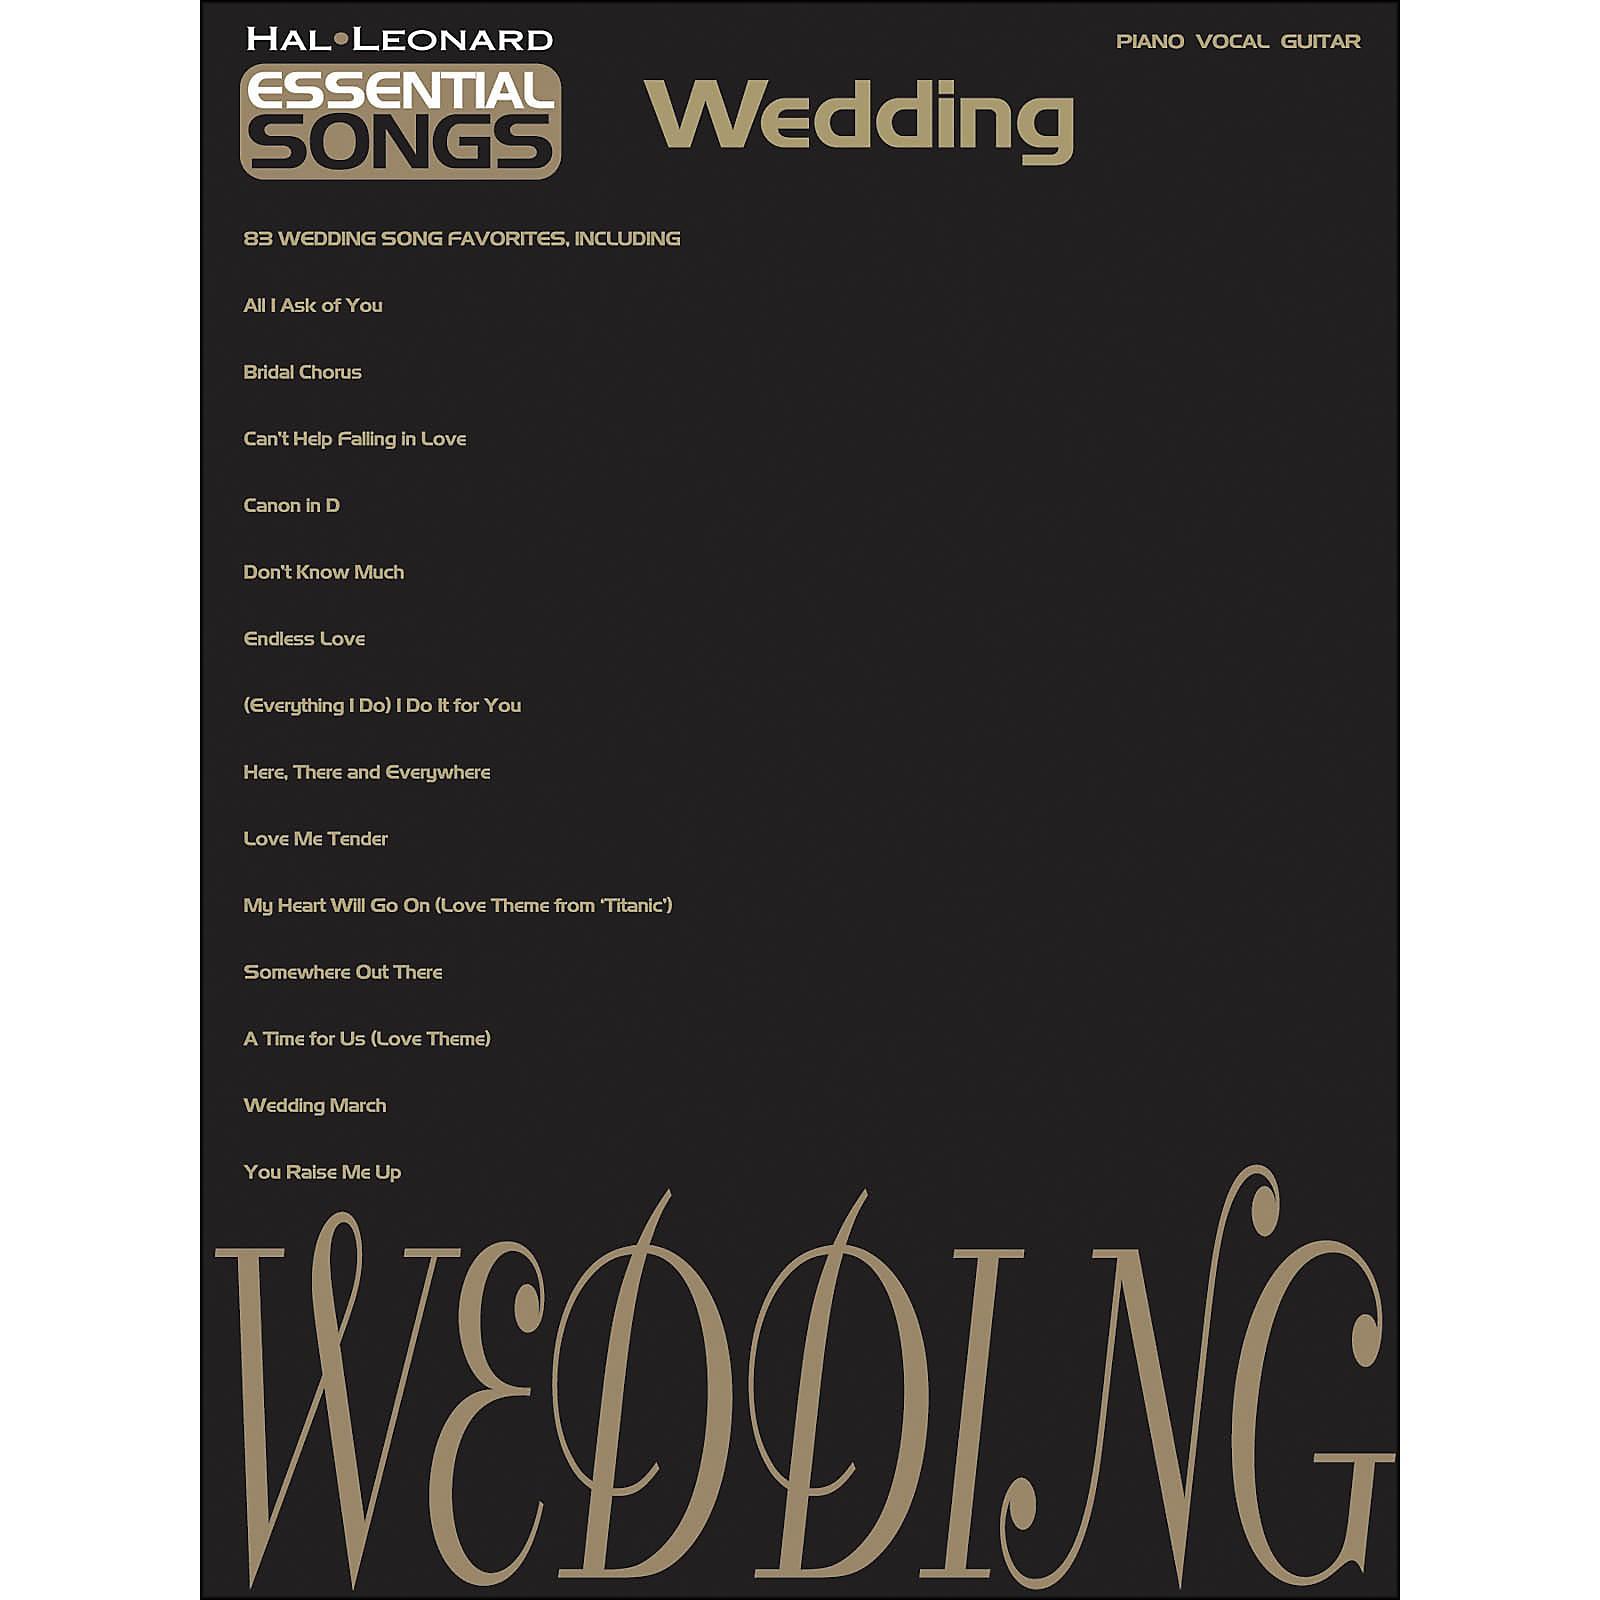 Hal Leonard Essential Songs - Wedding arranged for piano, vocal, and guitar (P/V/G)